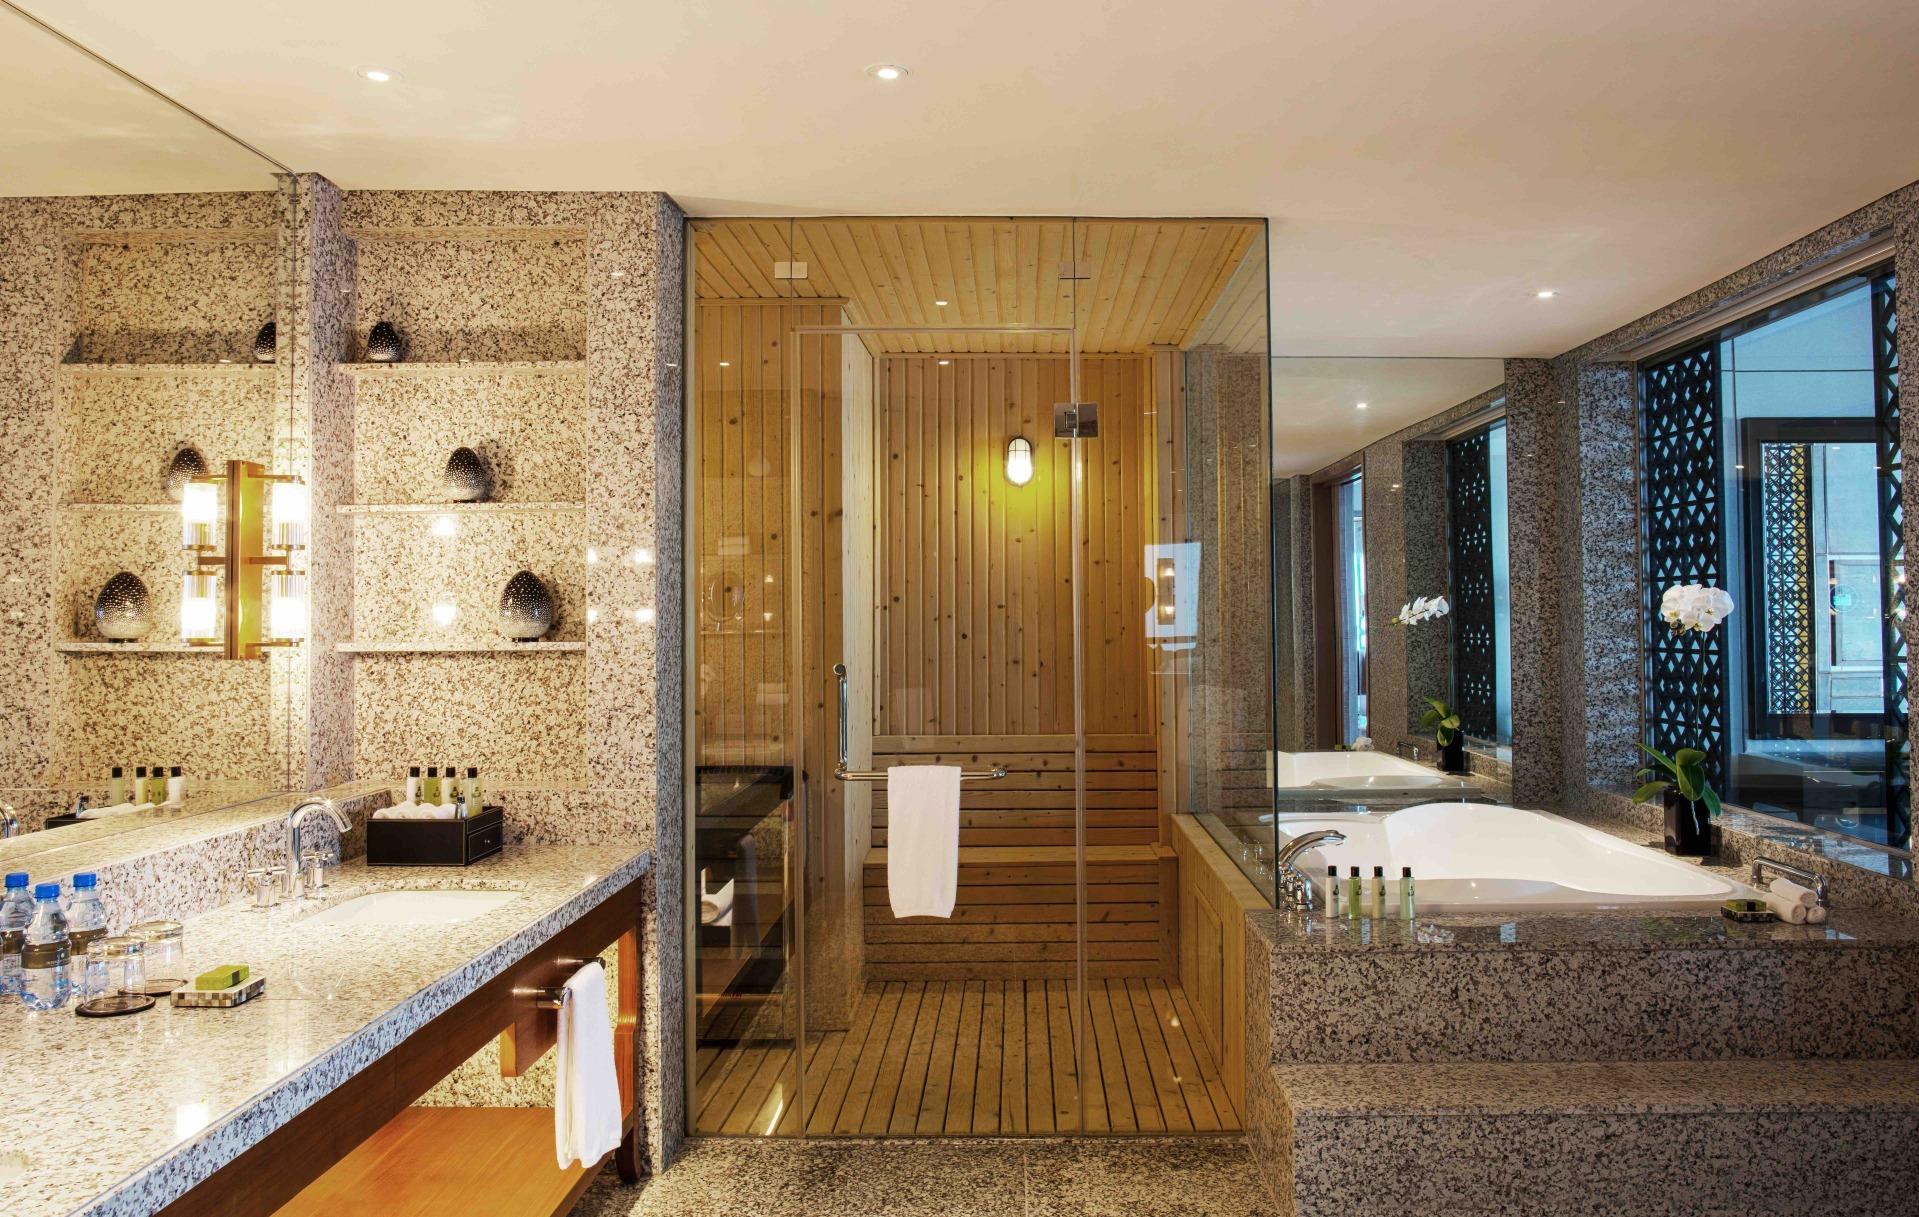 intercontinental hanoi luxury accommodation bathroom with jacuzzi and bathtub